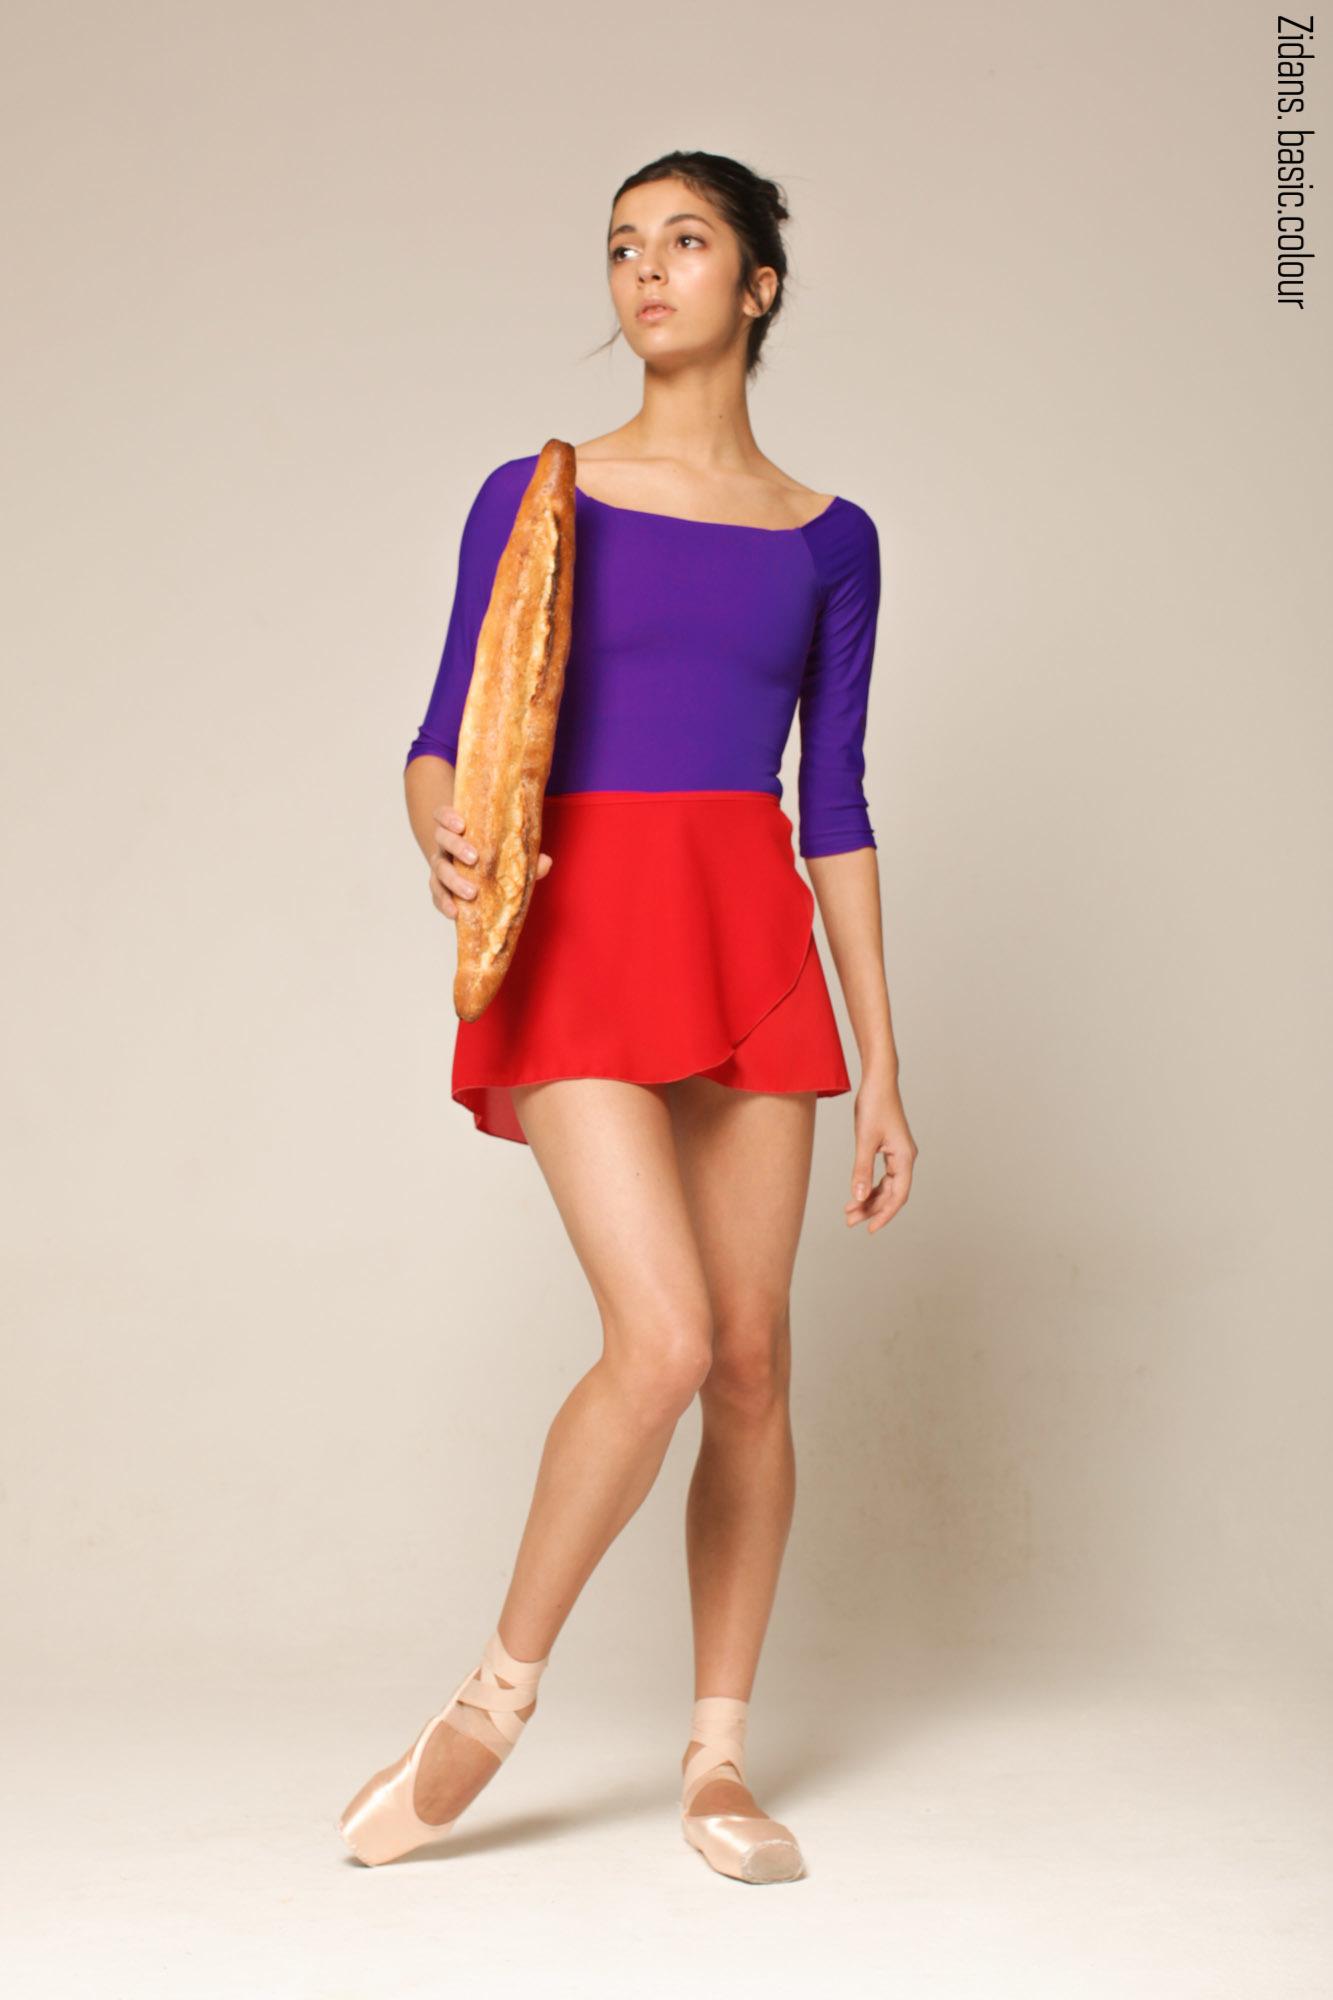 Scarlet wrap chiffon skirt  | 4 lengths